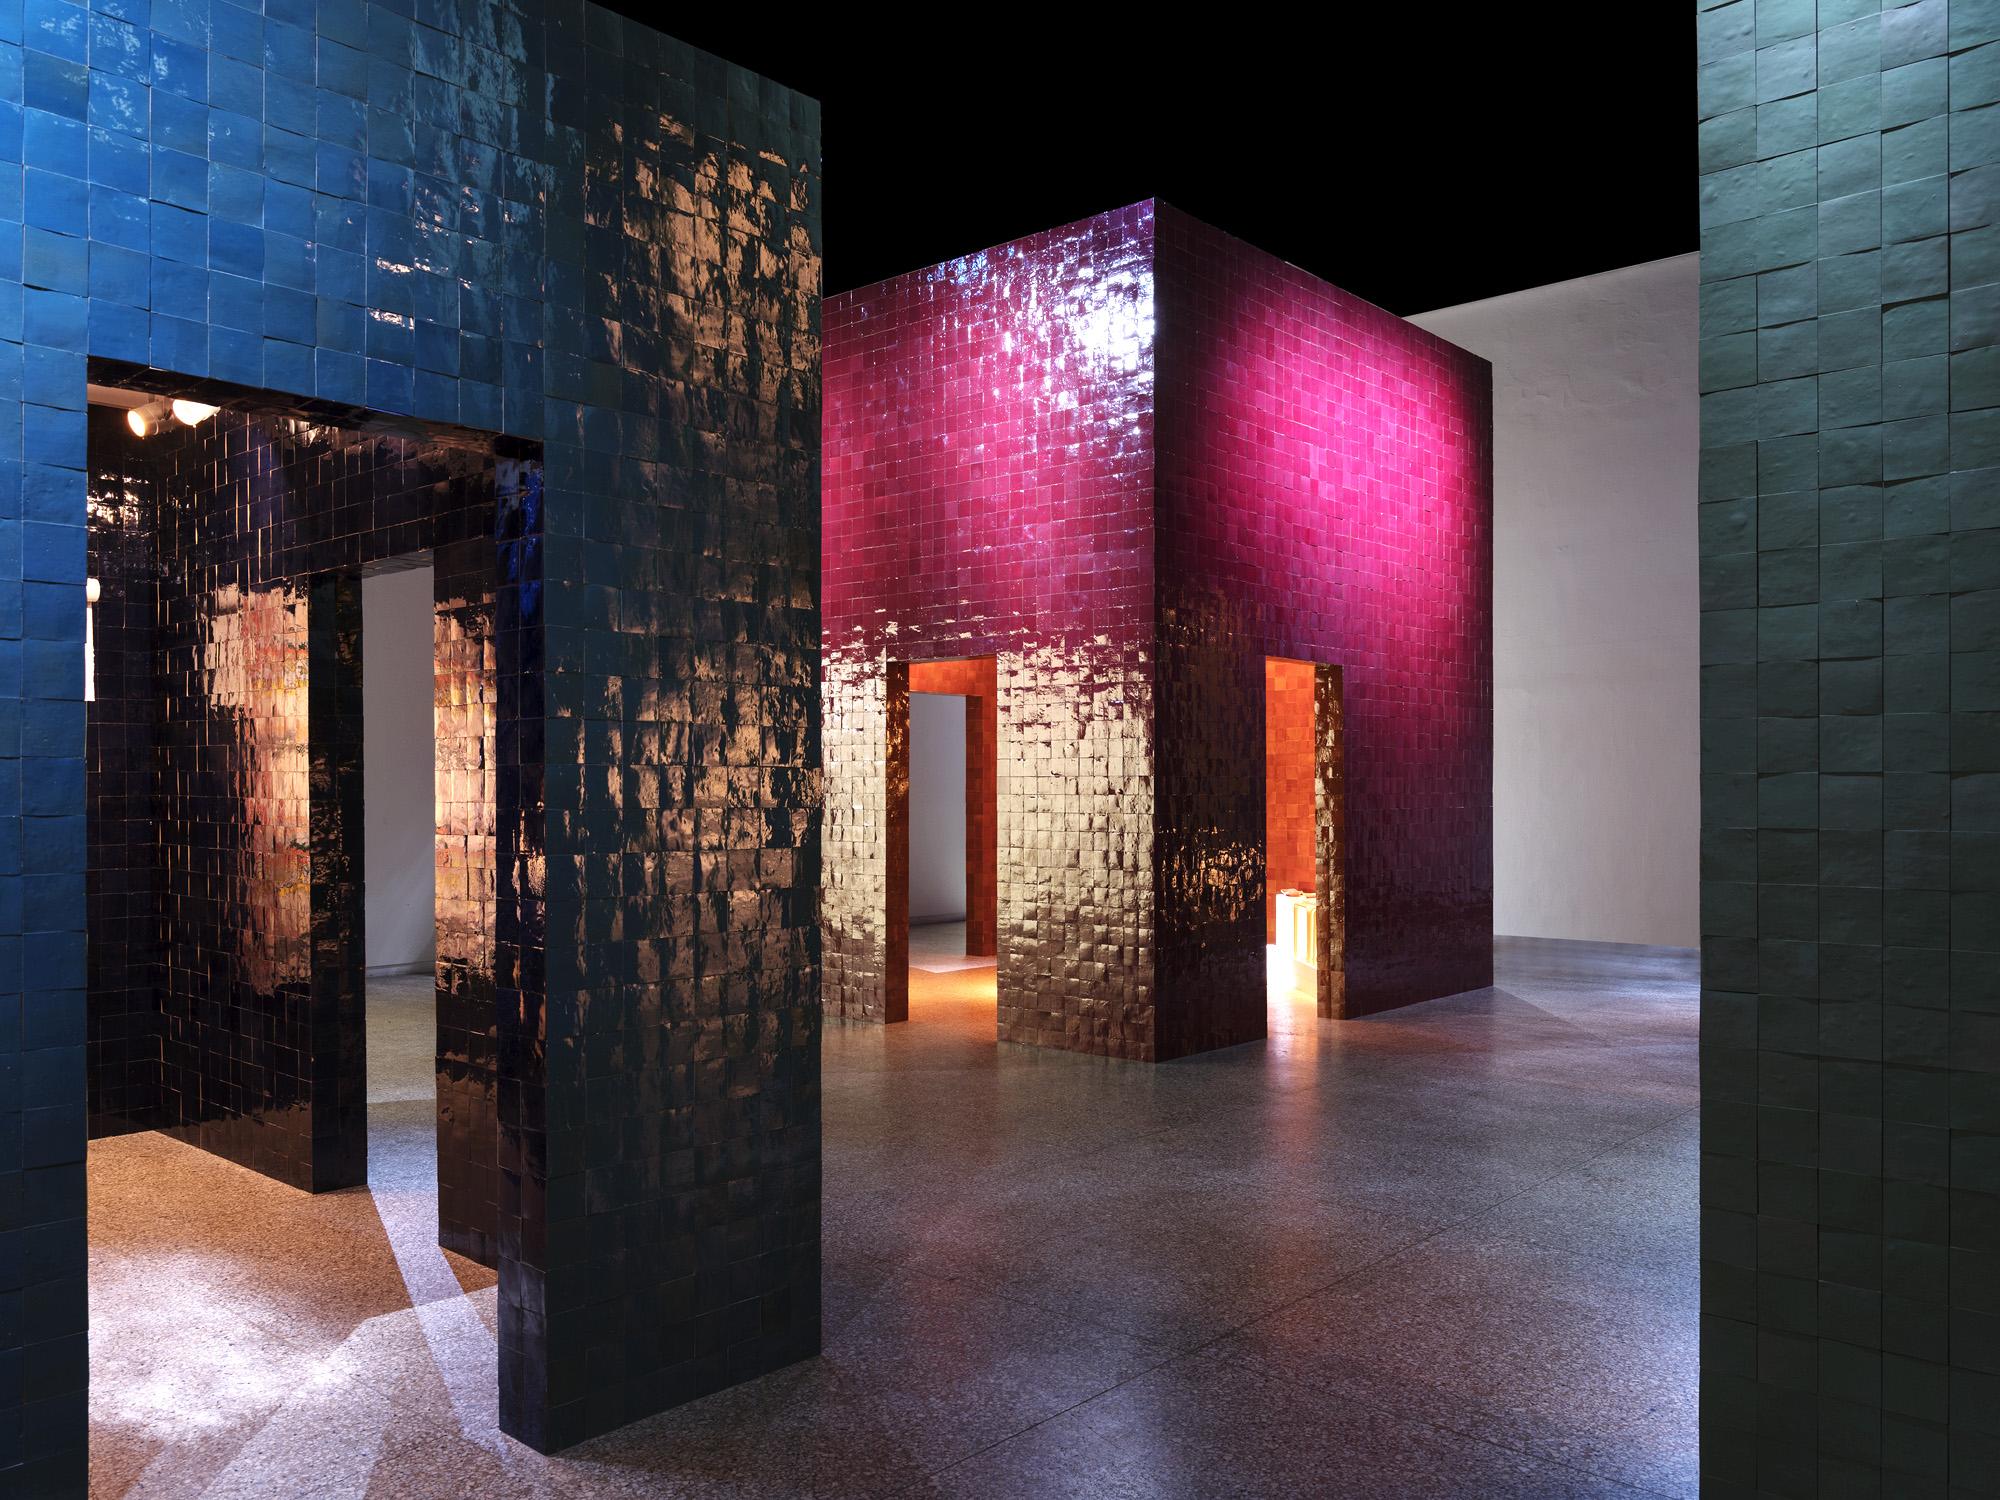 pavillon-hermes-2018-image4